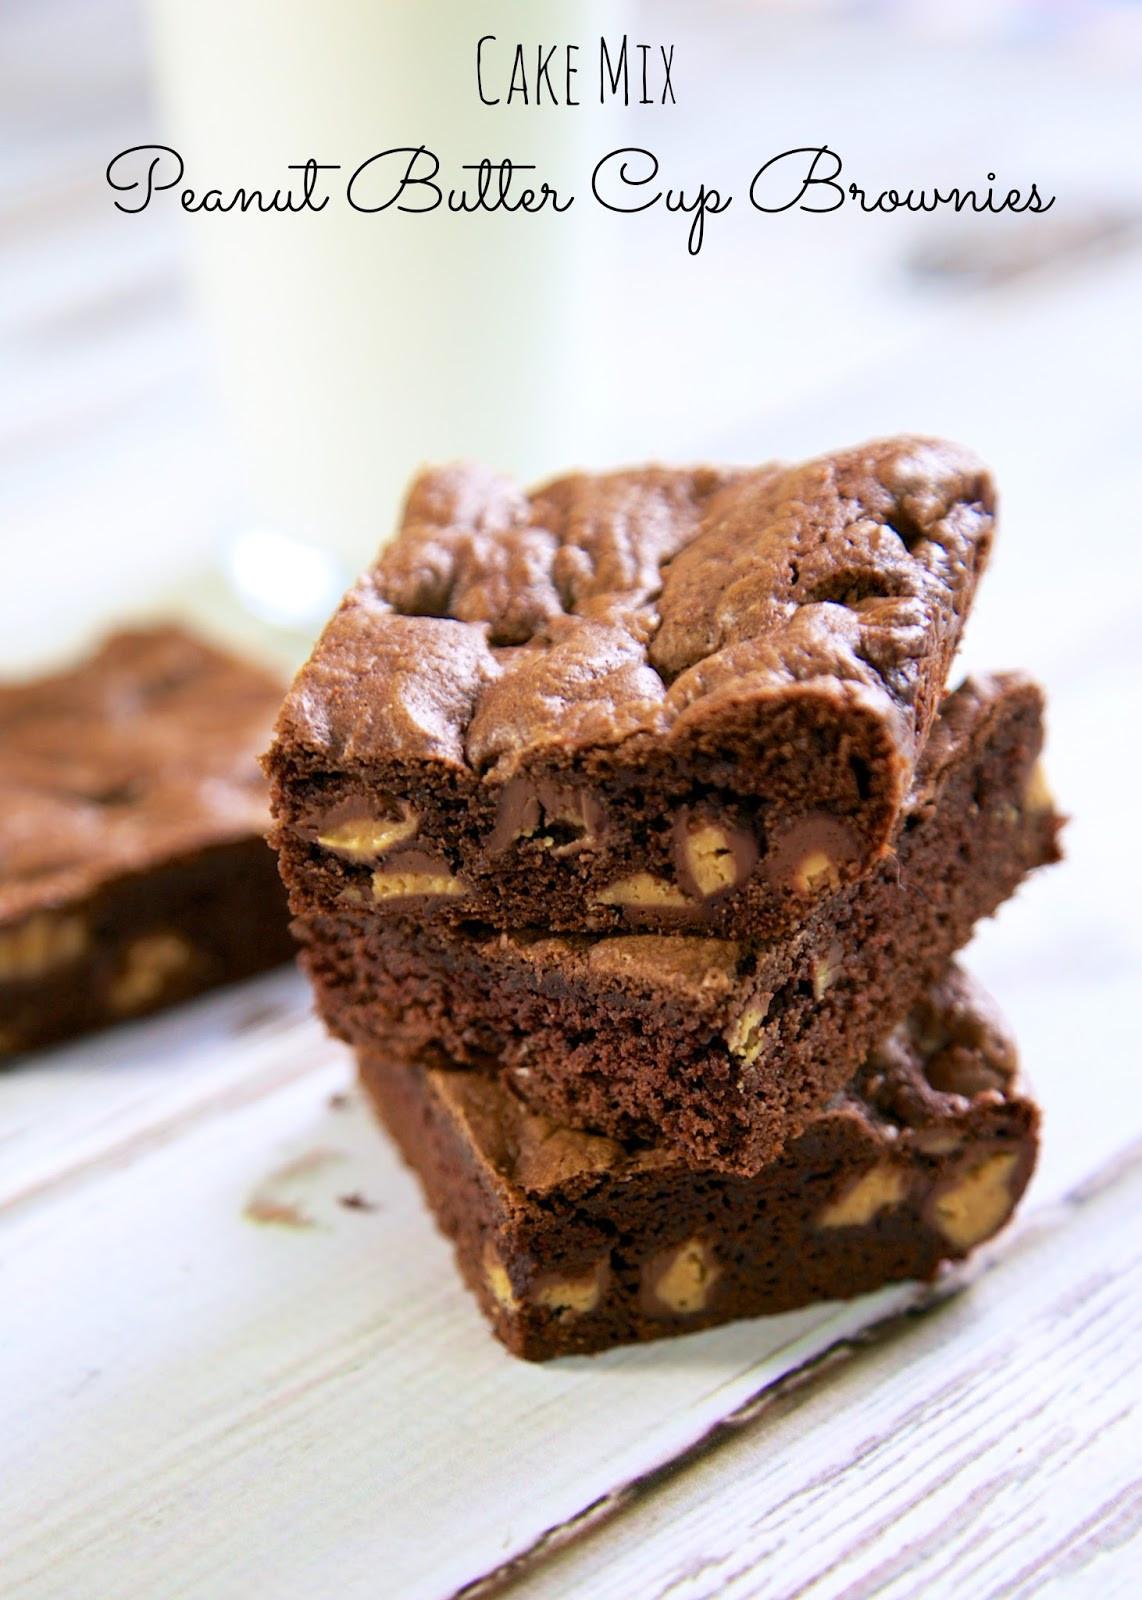 Cake Mix Brownies  Cake Mix Peanut Butter Cup Brownies